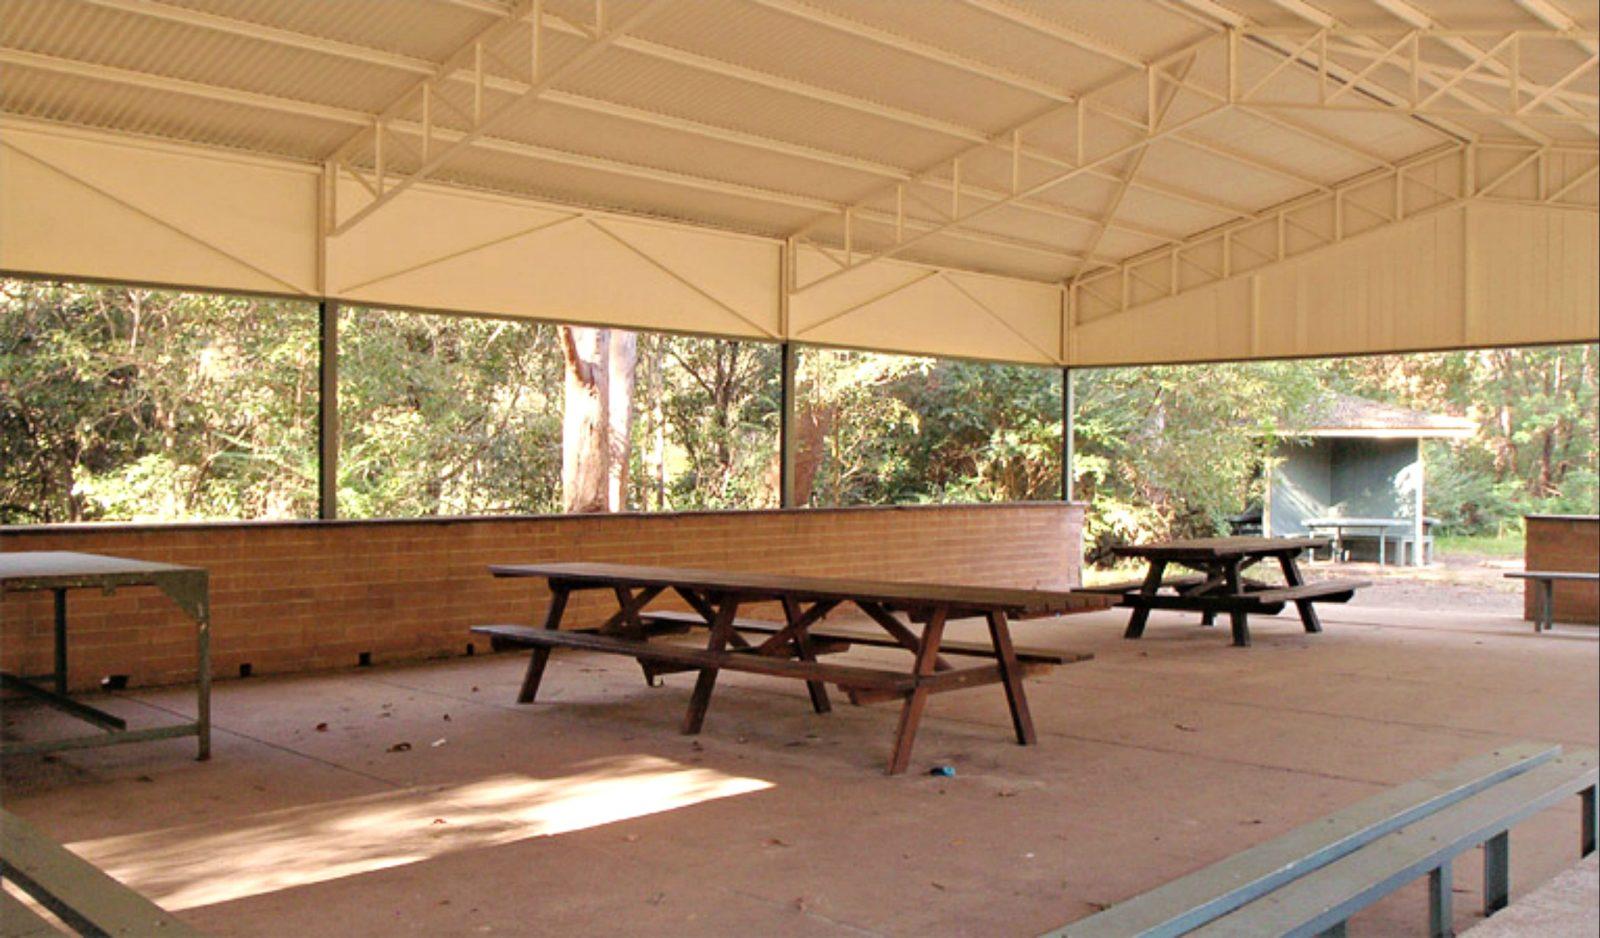 Commandment Rock picnic area shelter, Lane Cove National Park. Photo: Natalie Saville